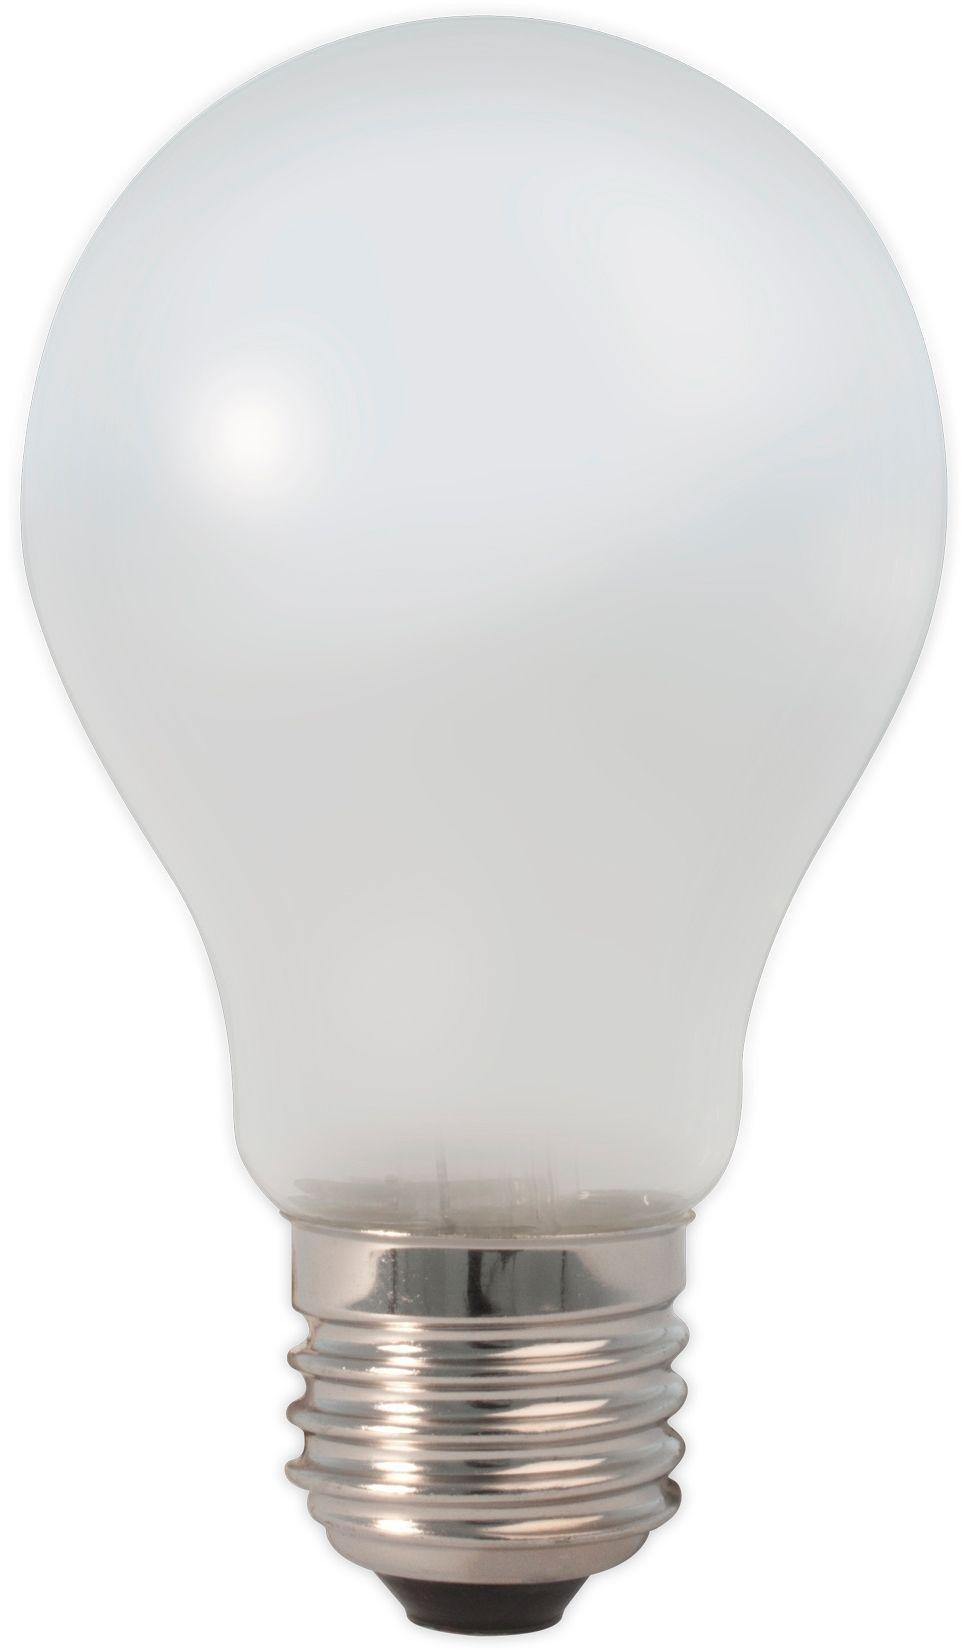 Image of Calex 6W LED Filament GLS Warm White 580 Lumen Opal Bulb